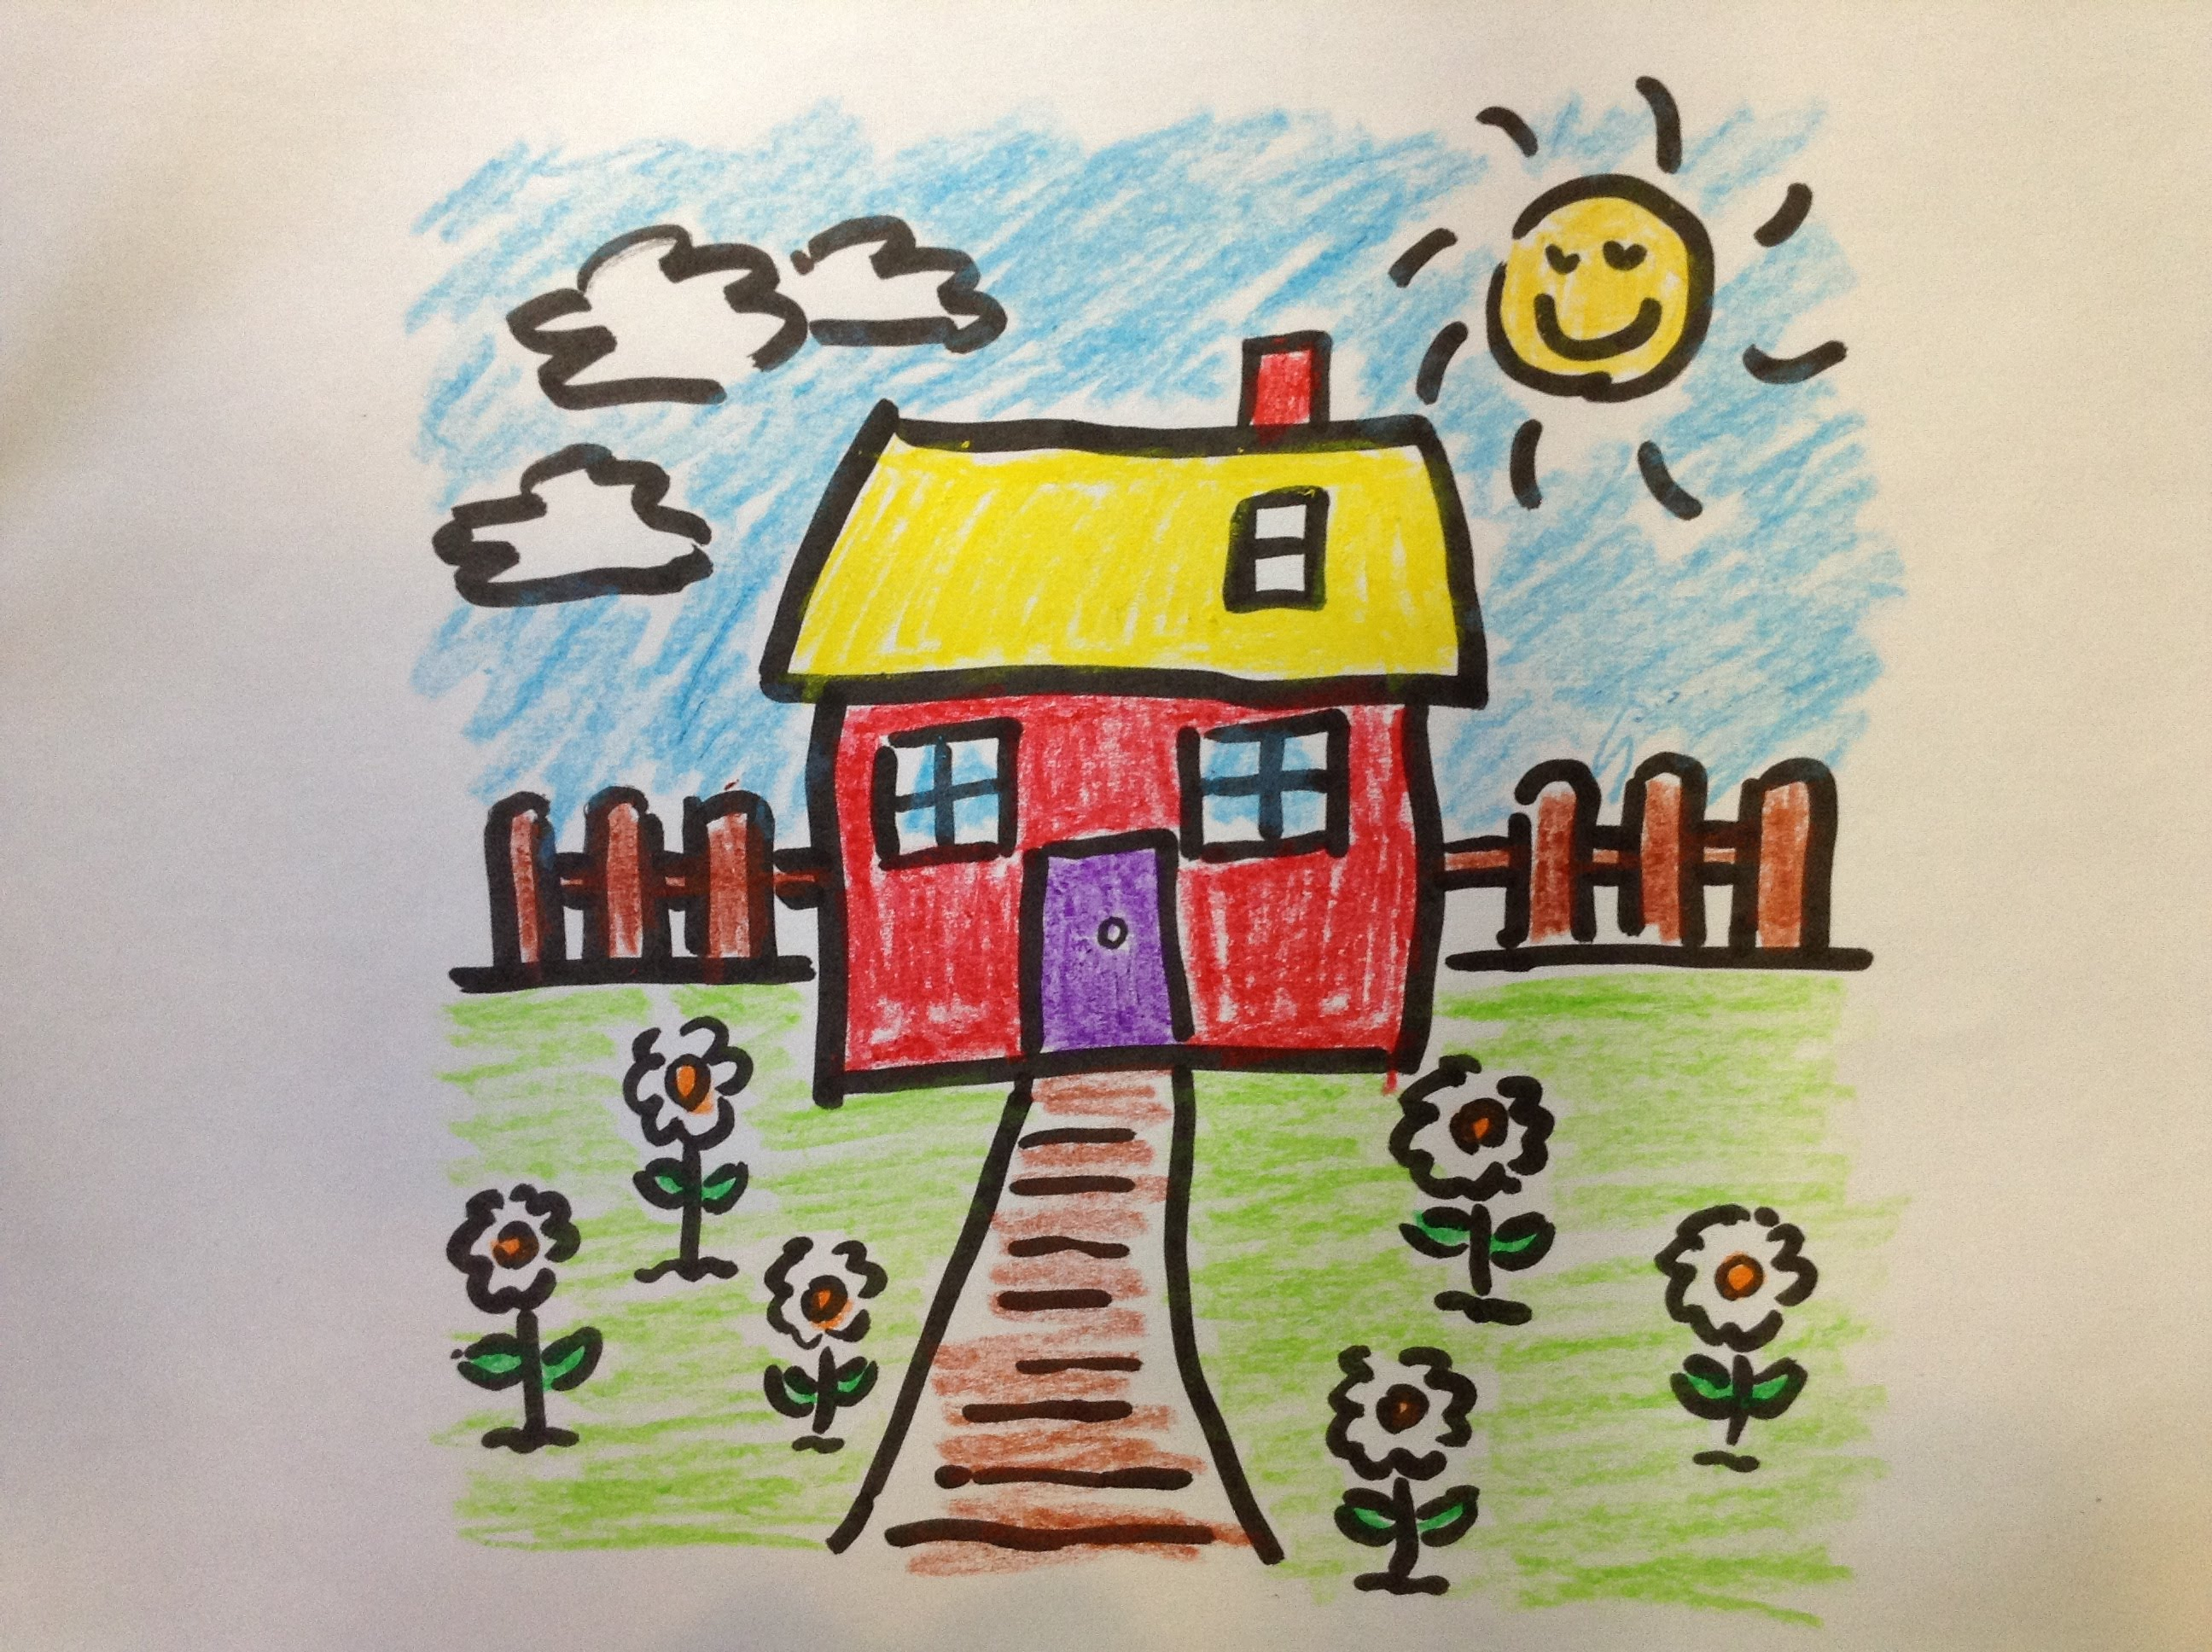 2592x1936 My Beautiful Garden Drawing How To Draw A Cartoon Flower Garden